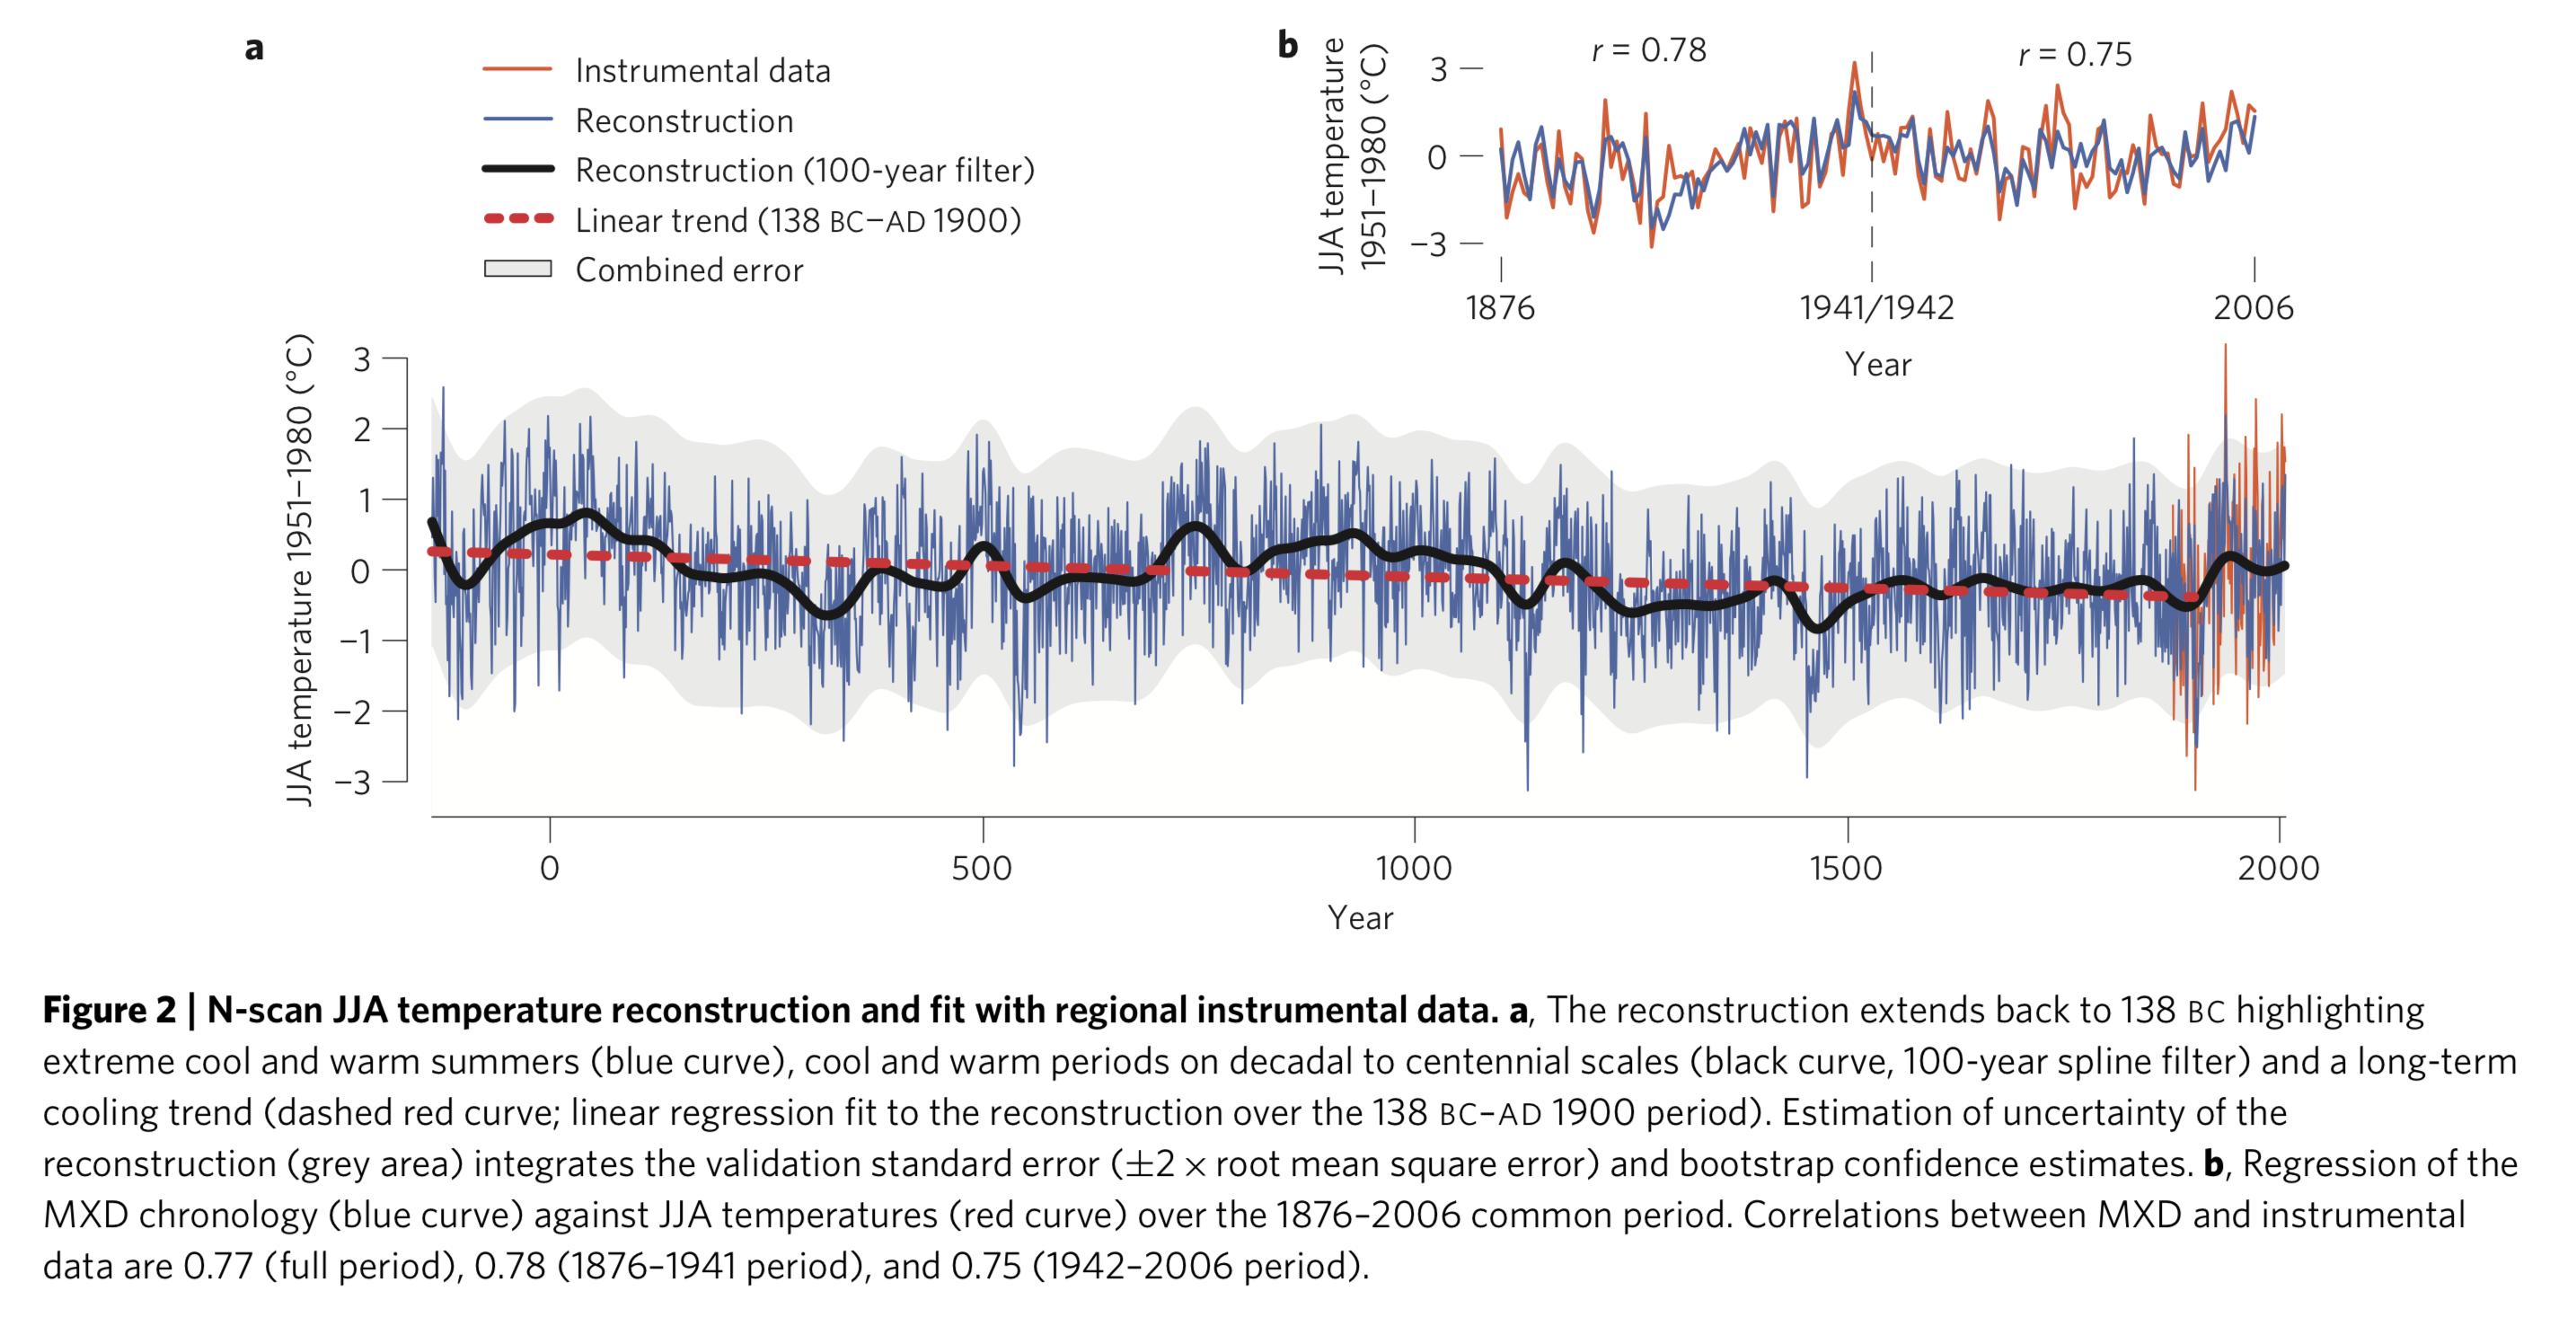 Klimaentwicklung gemäss Esper, Büntgen et al. 2012